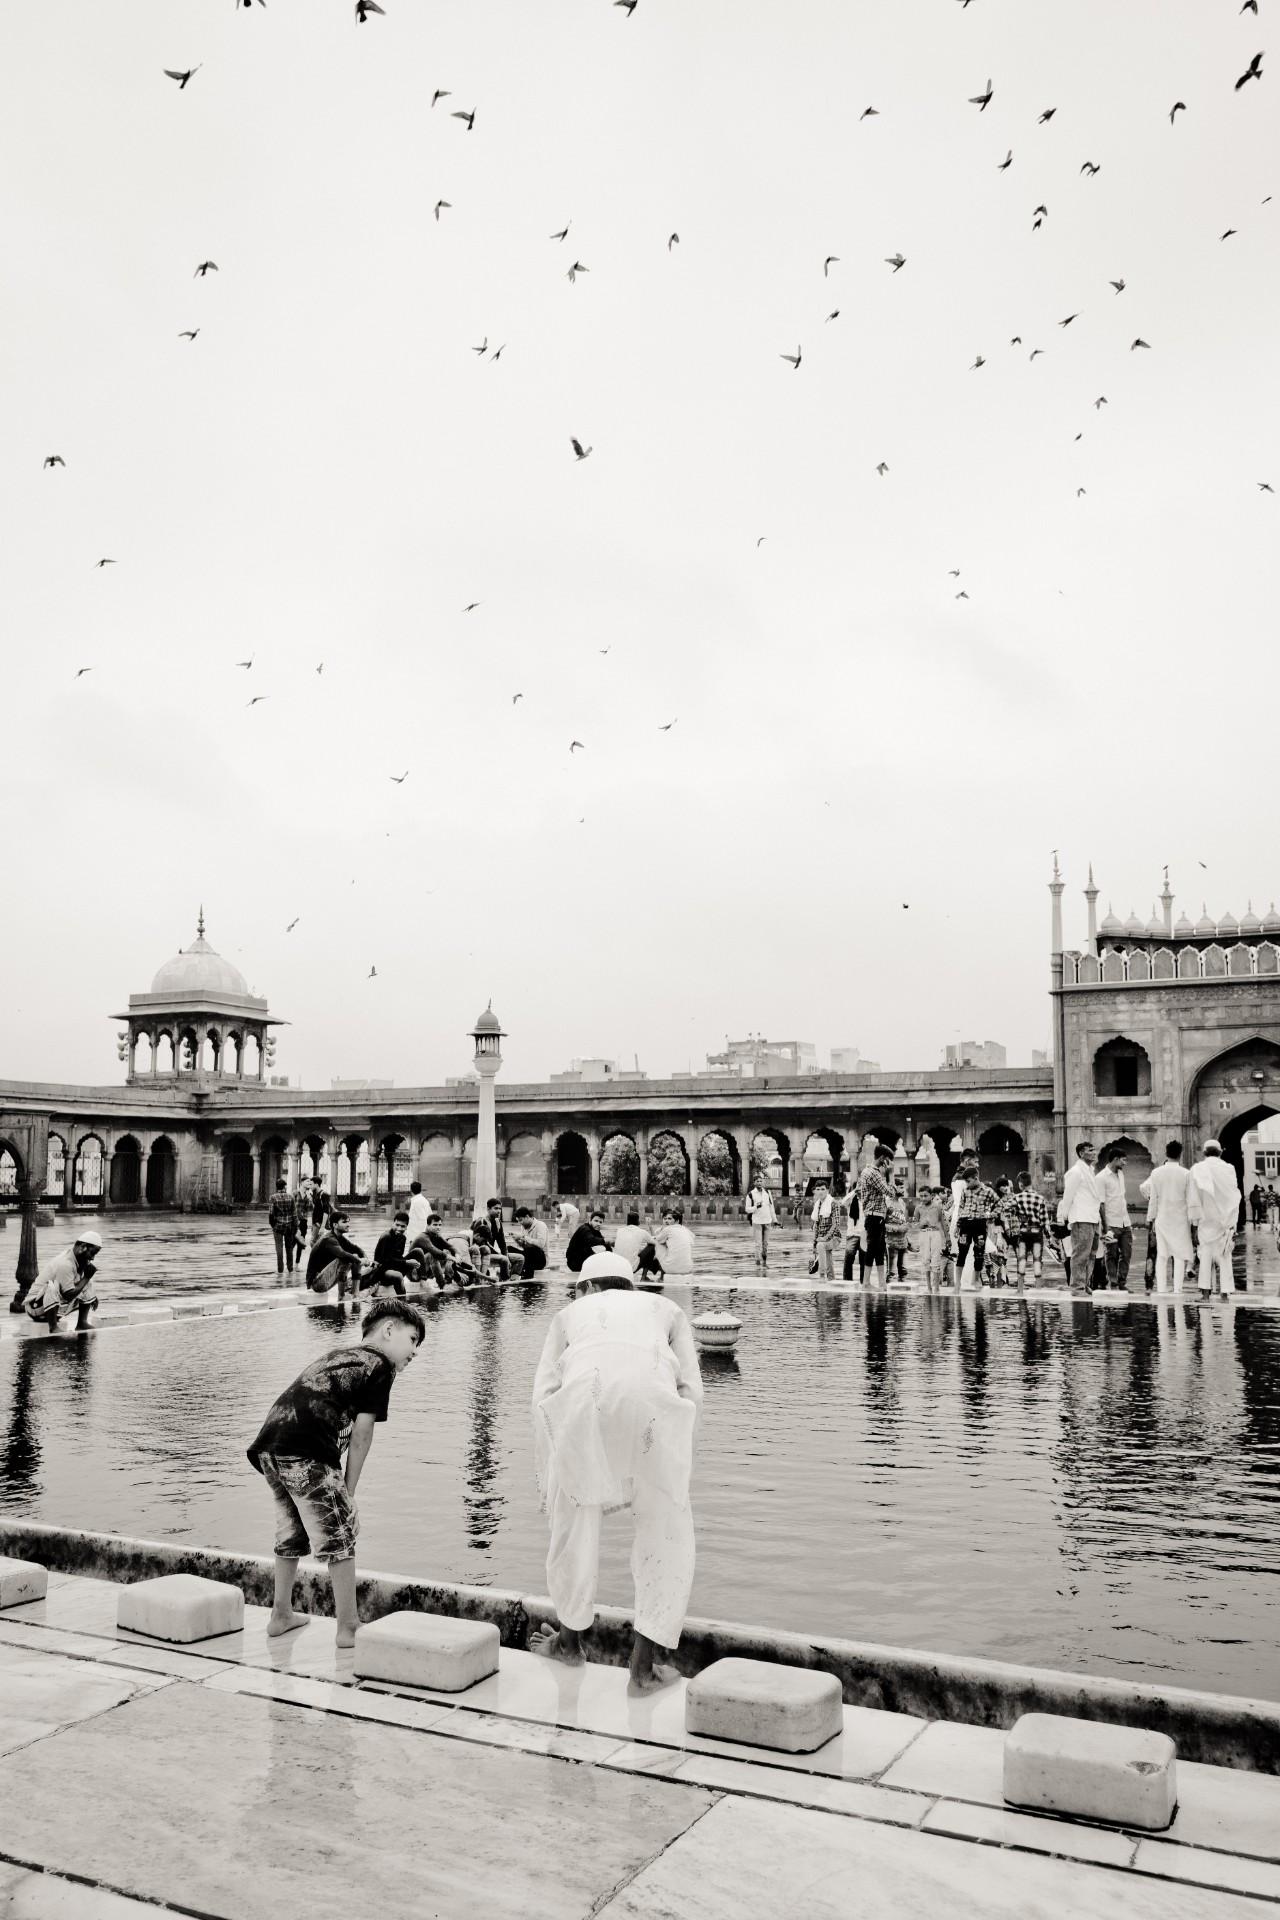 10-Delhi-02-16